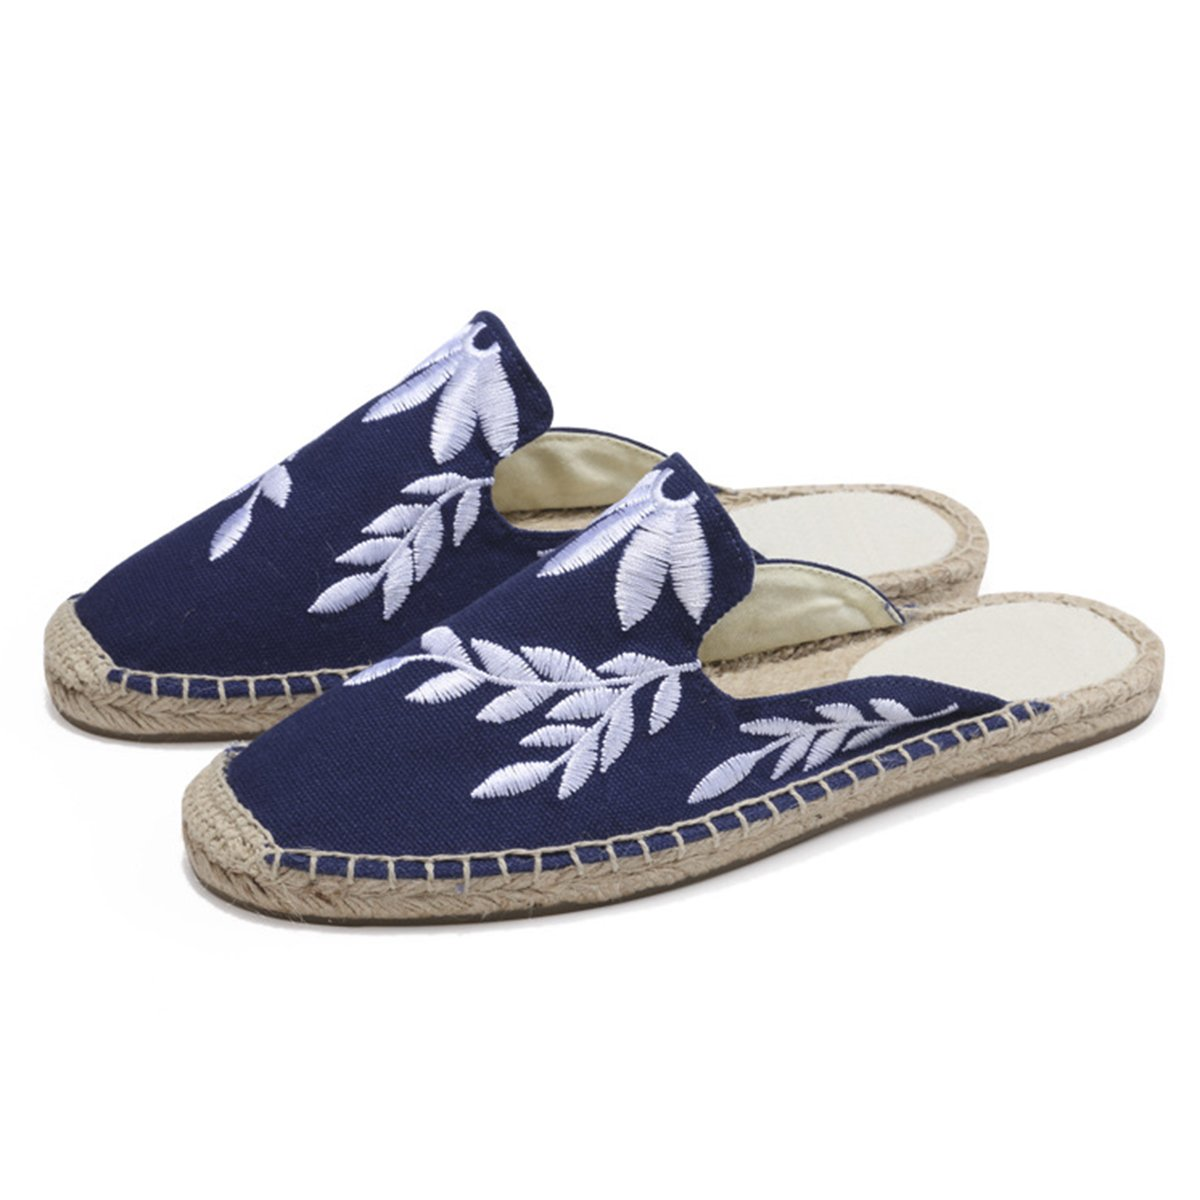 LaRosa Women's Stylish Embroidery Leaf Flat Espadrilles,Blue,7 B(M)